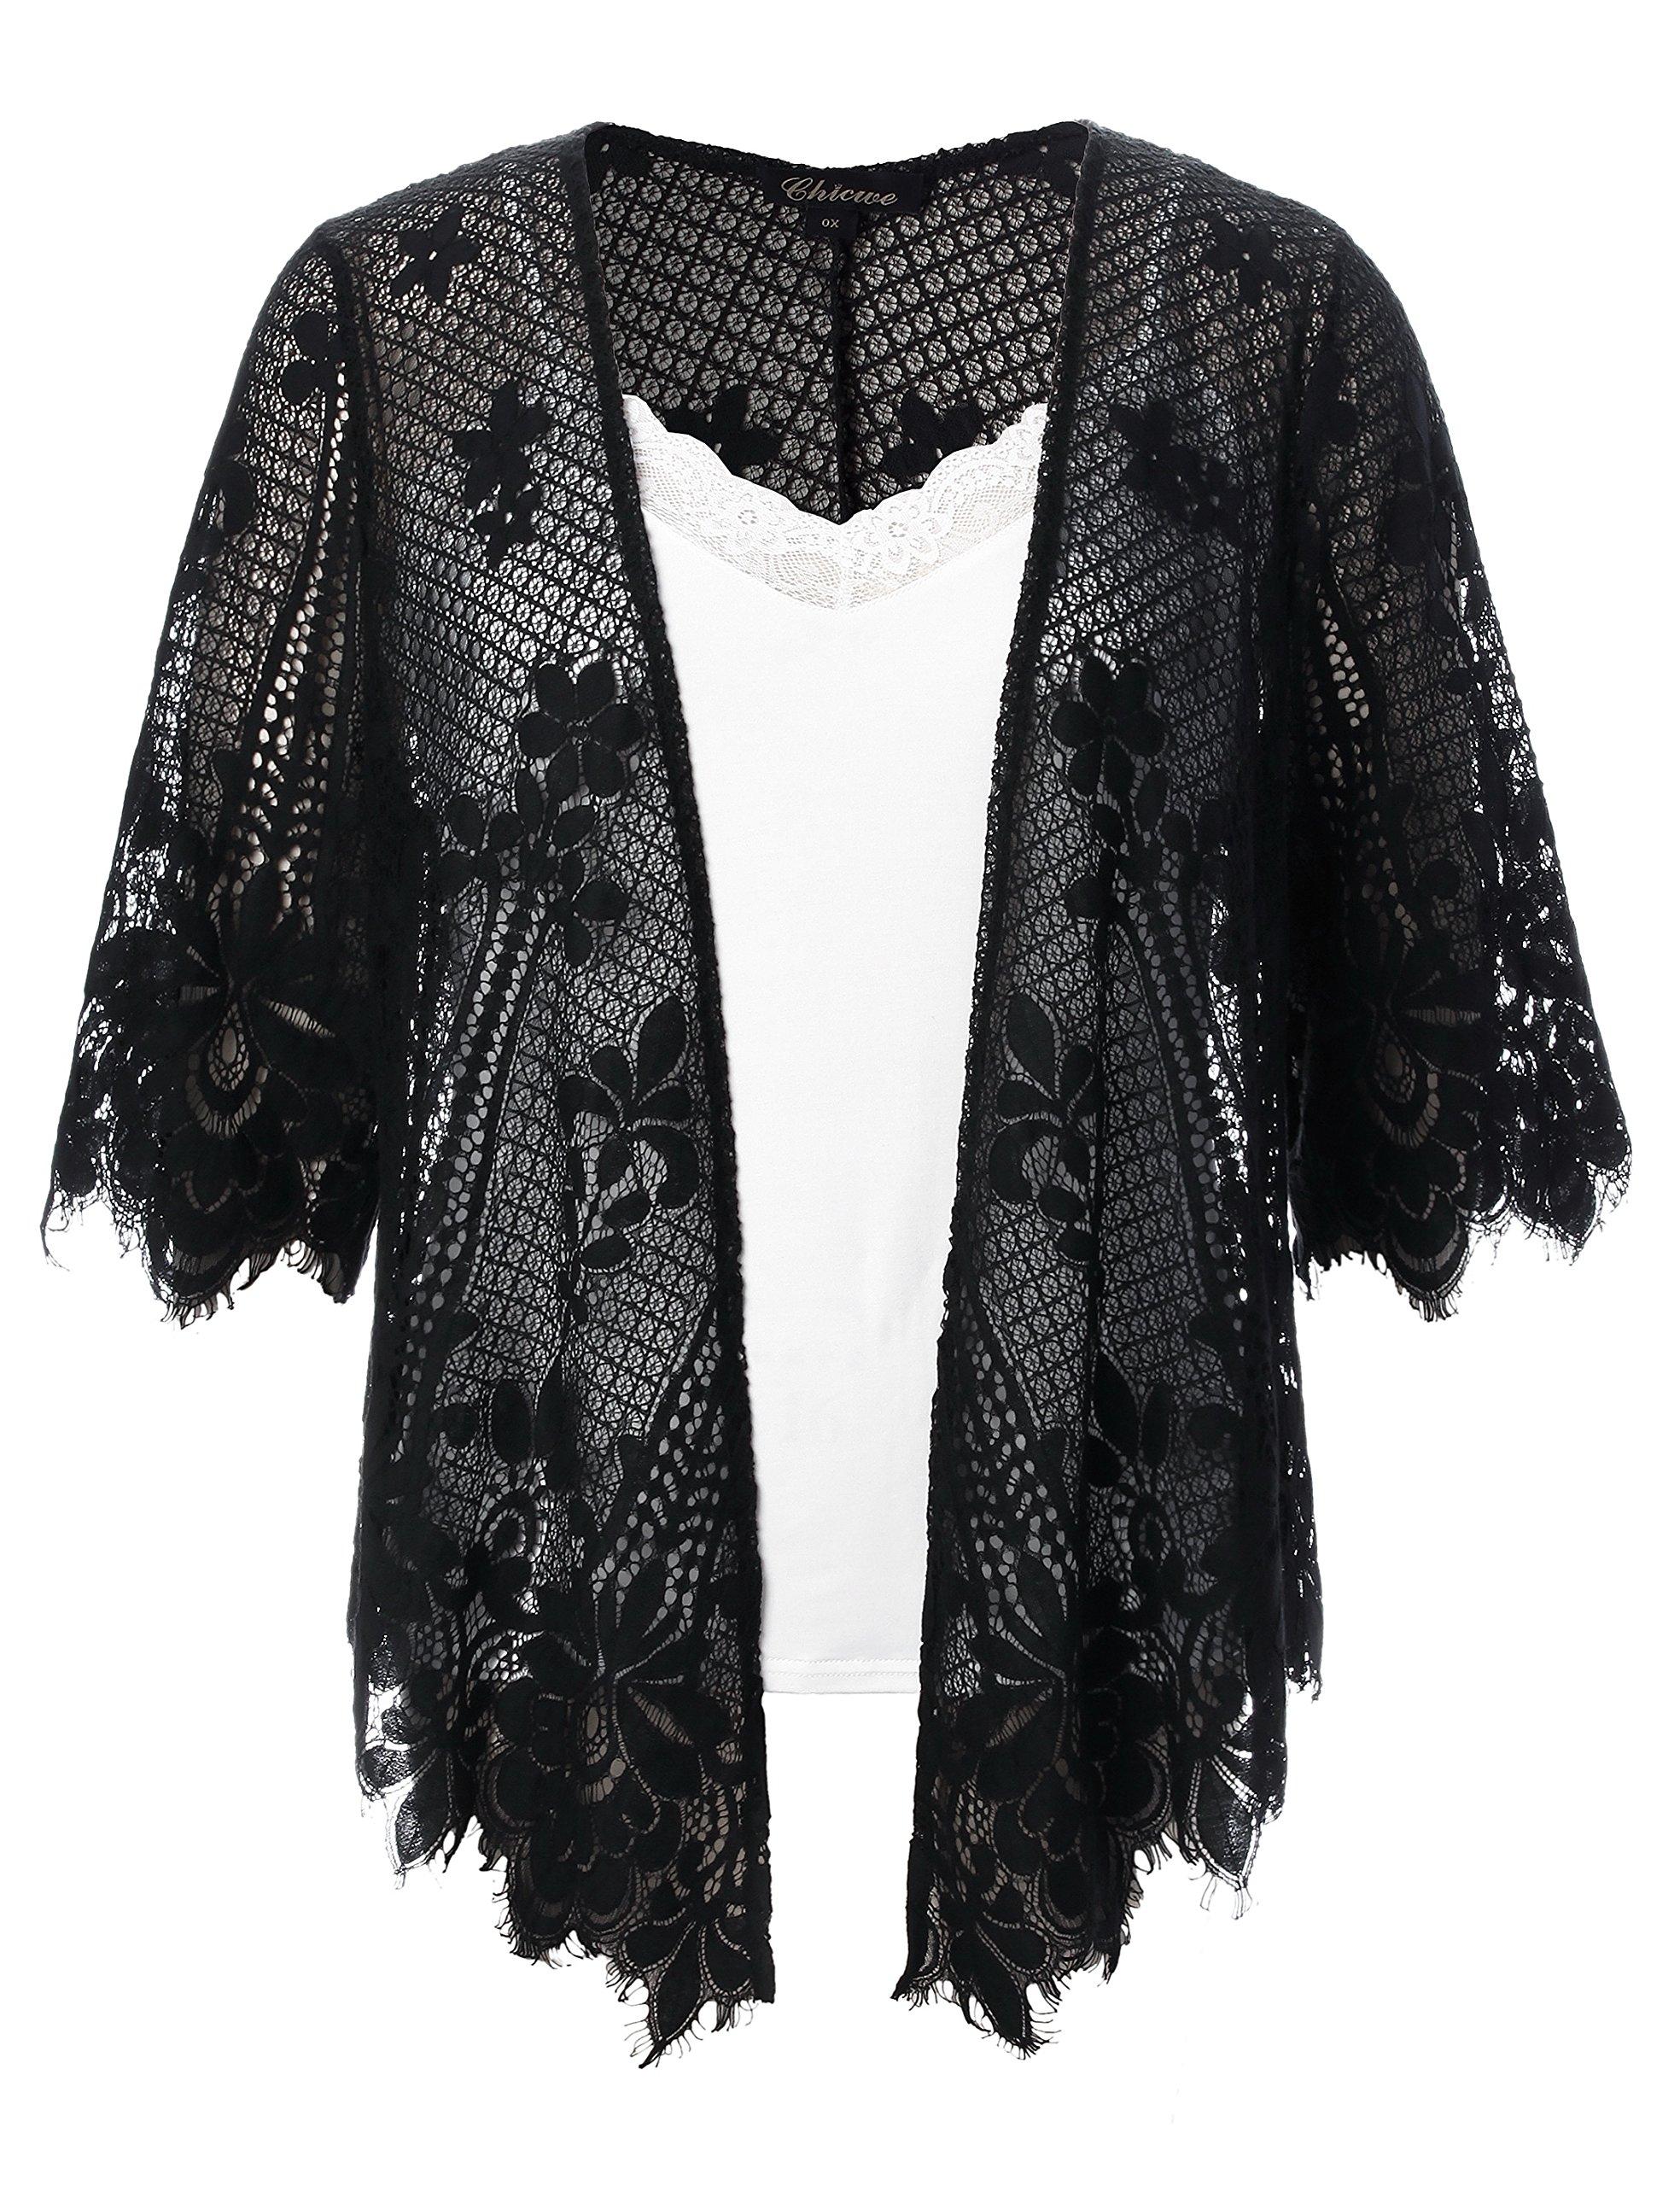 Chicwe Women's Plus Size Scalloped Lace Kimono Lace Cover Up Top Black 2X